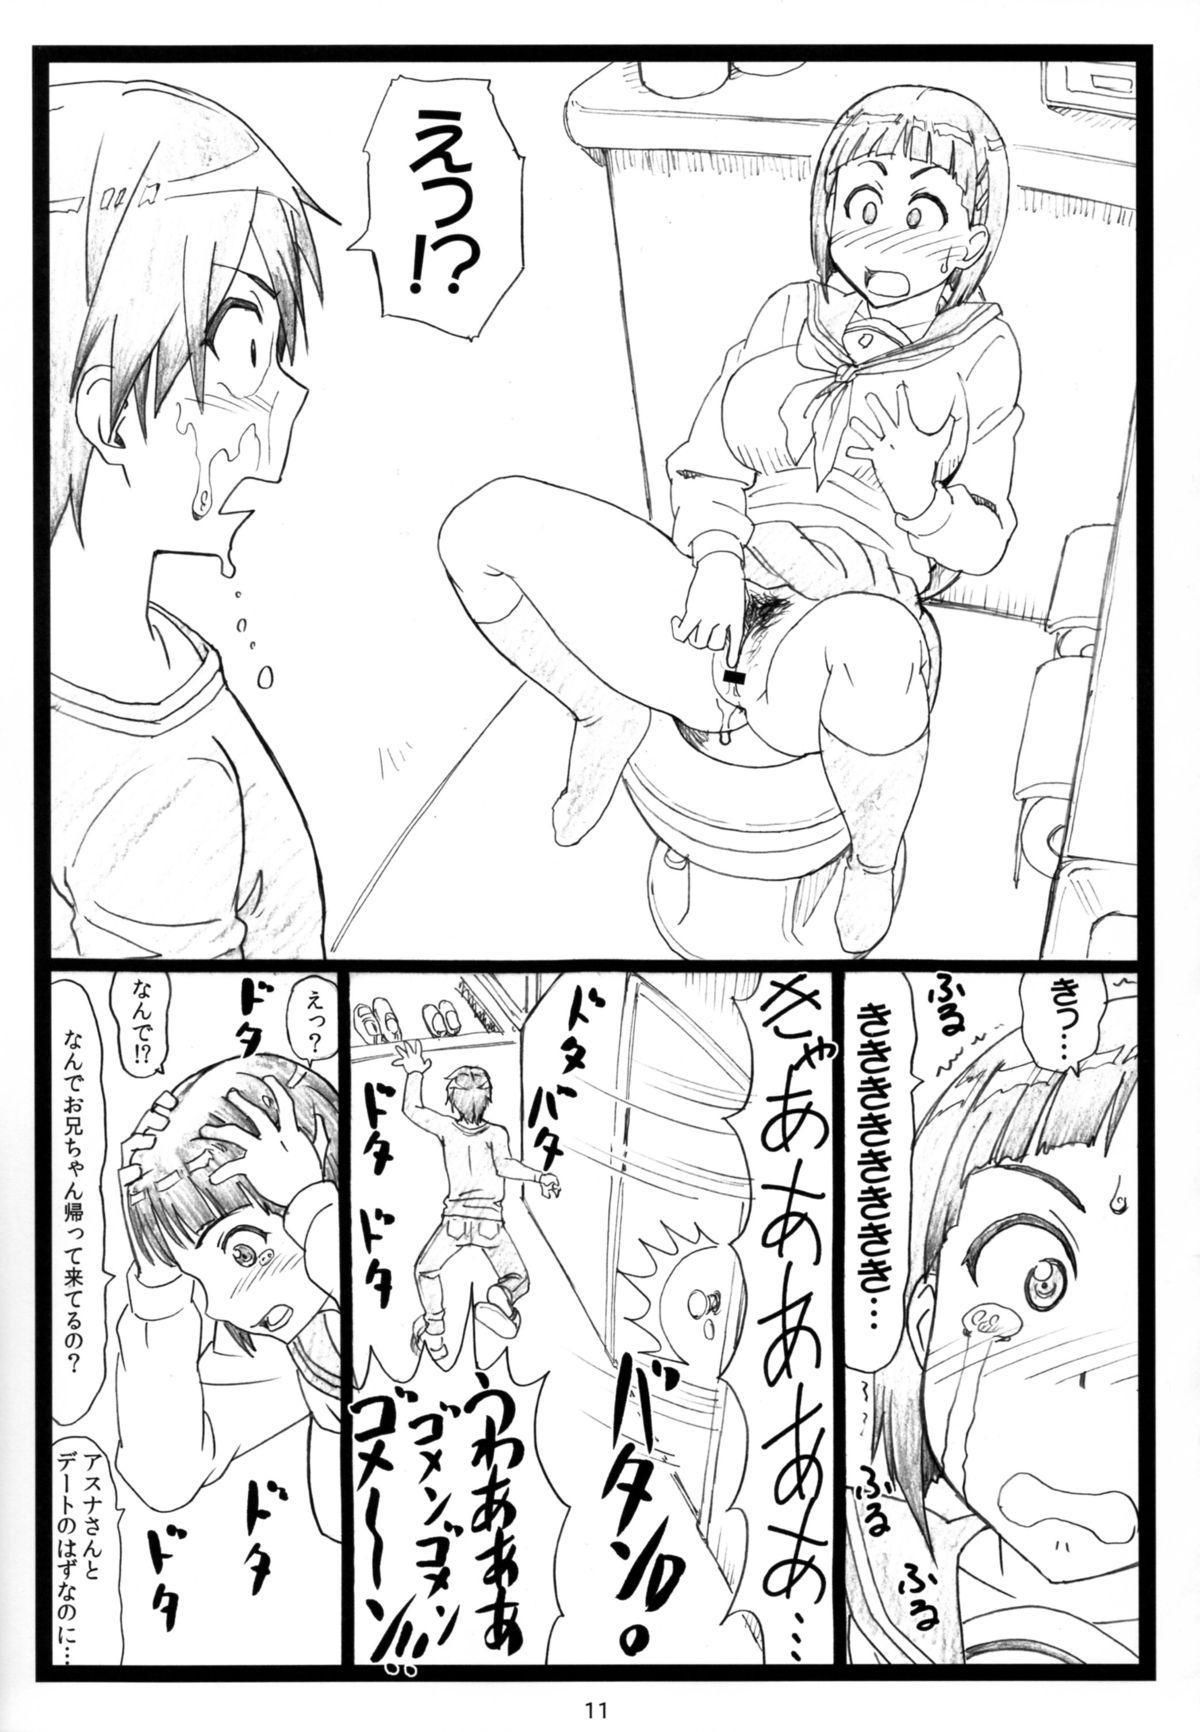 Kuzuha 10